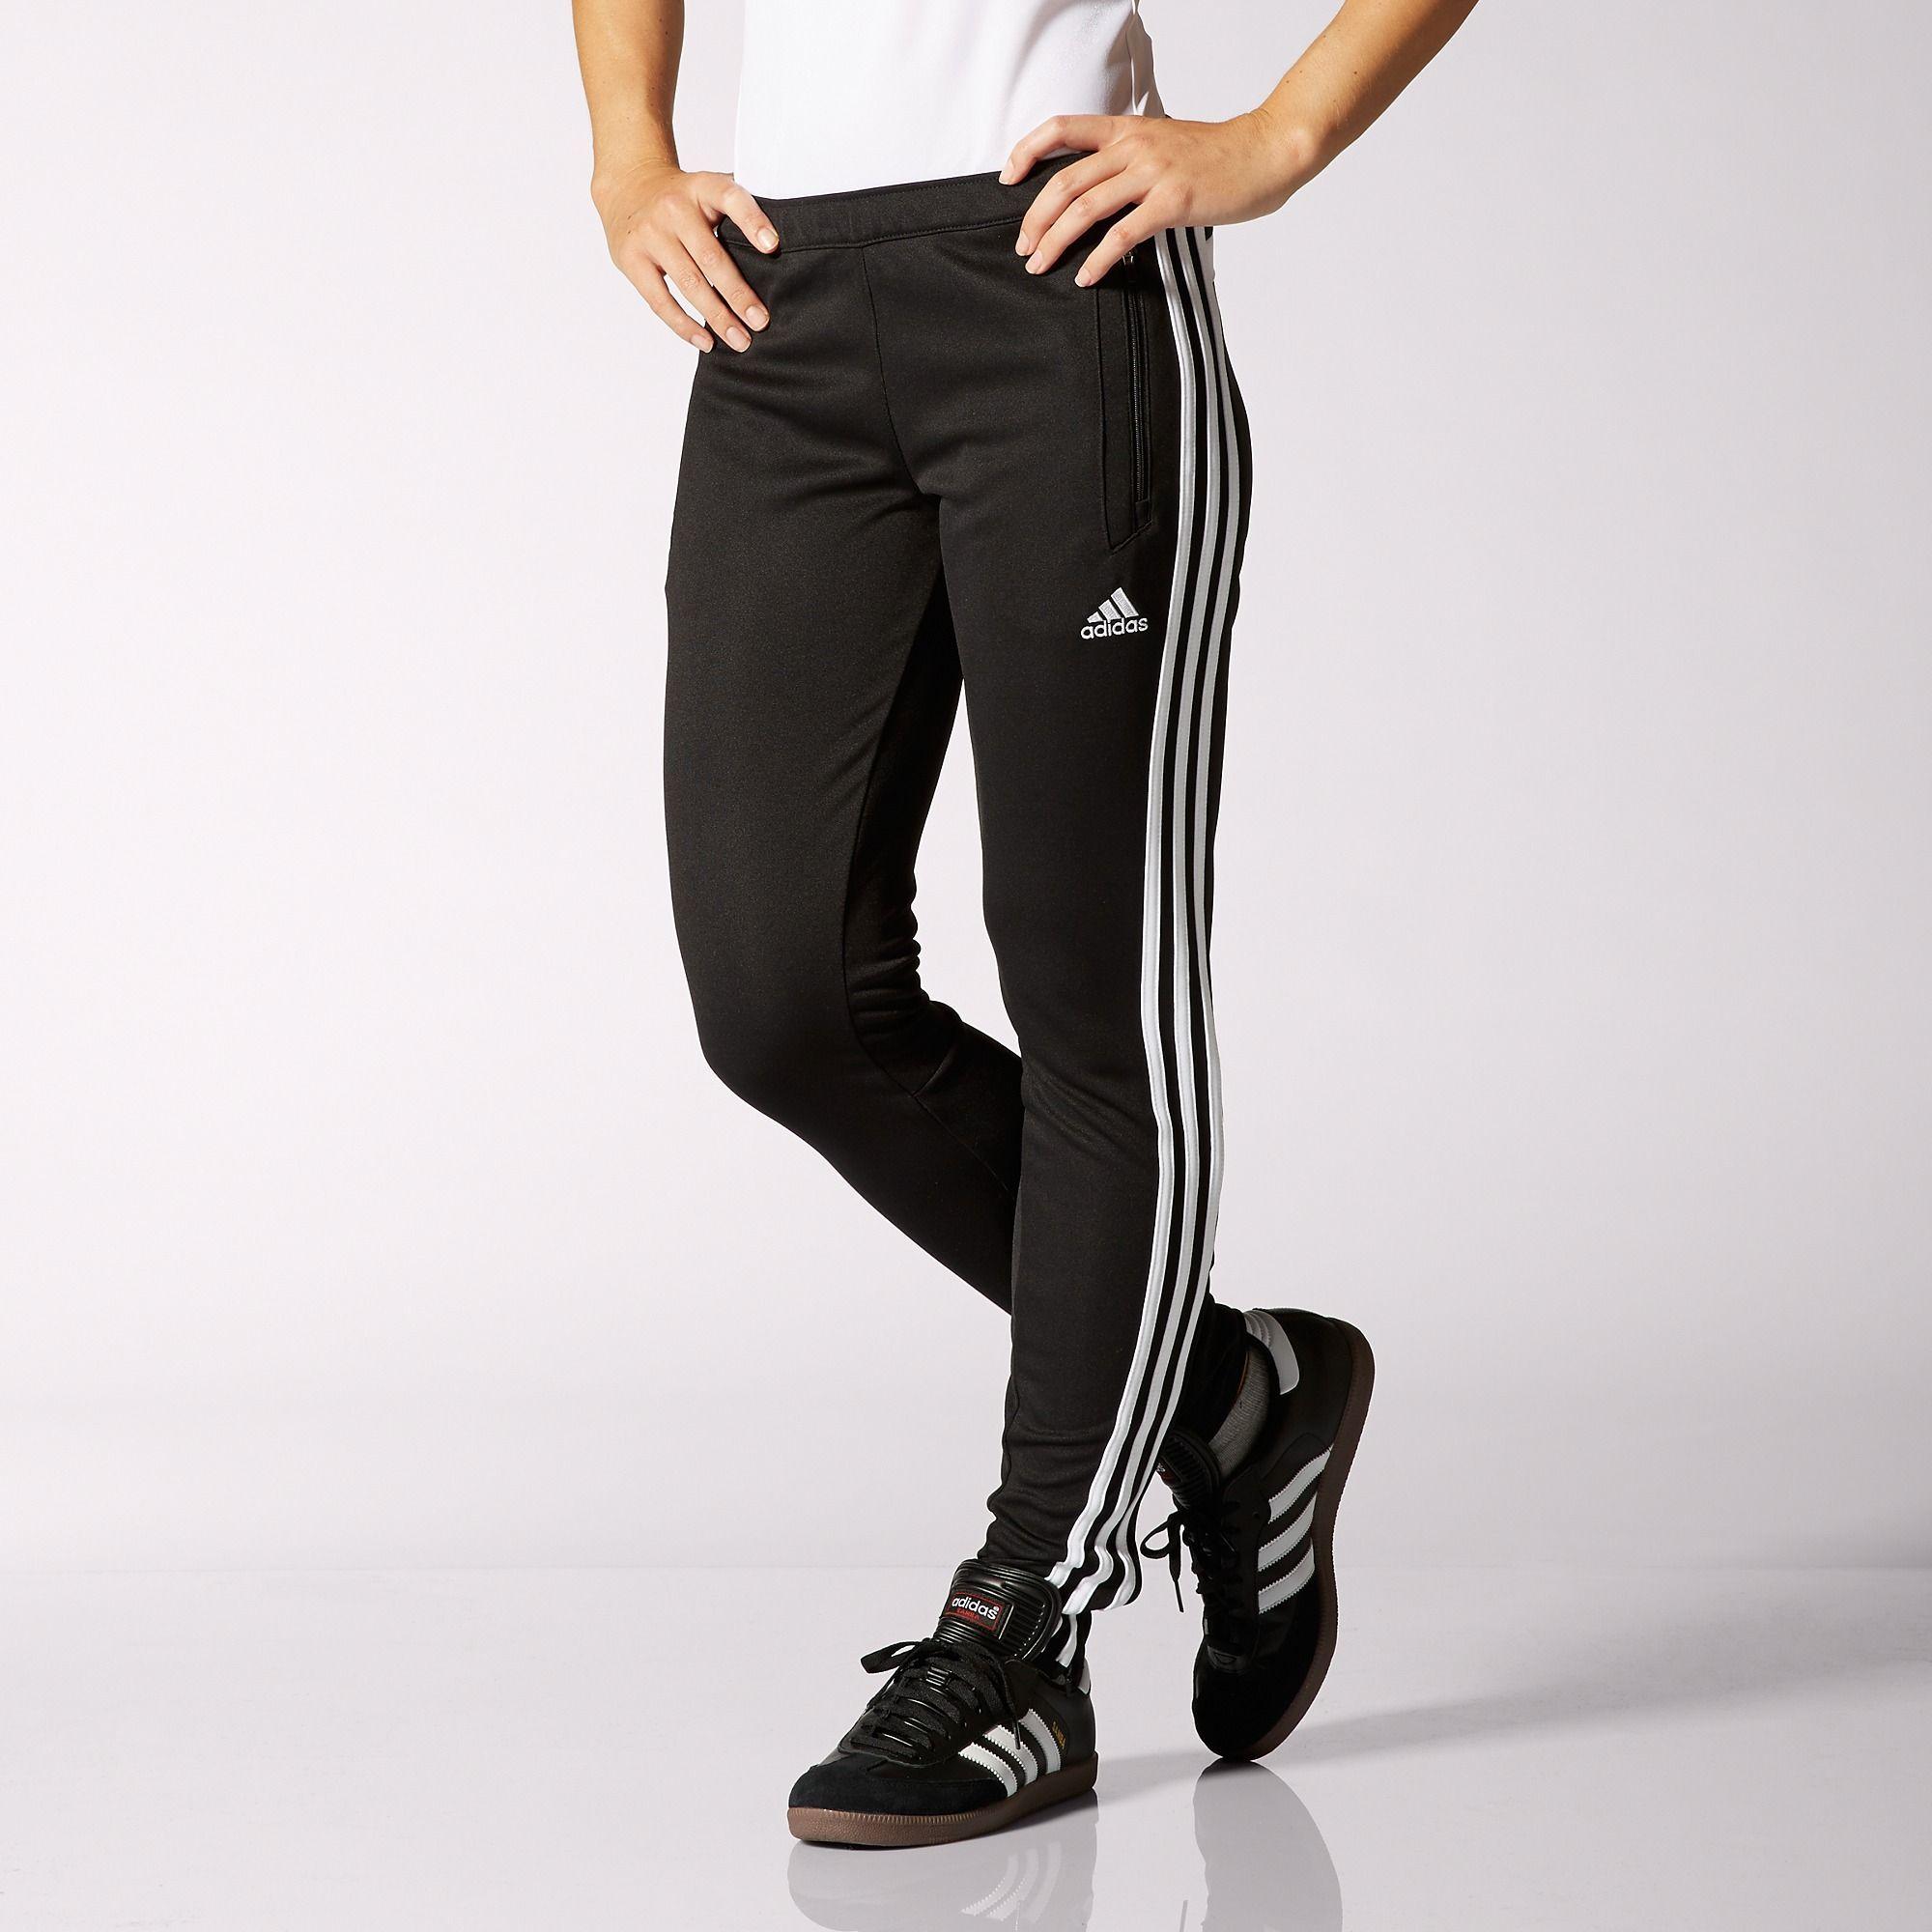 Adidas Soccer Pants Tiro 13